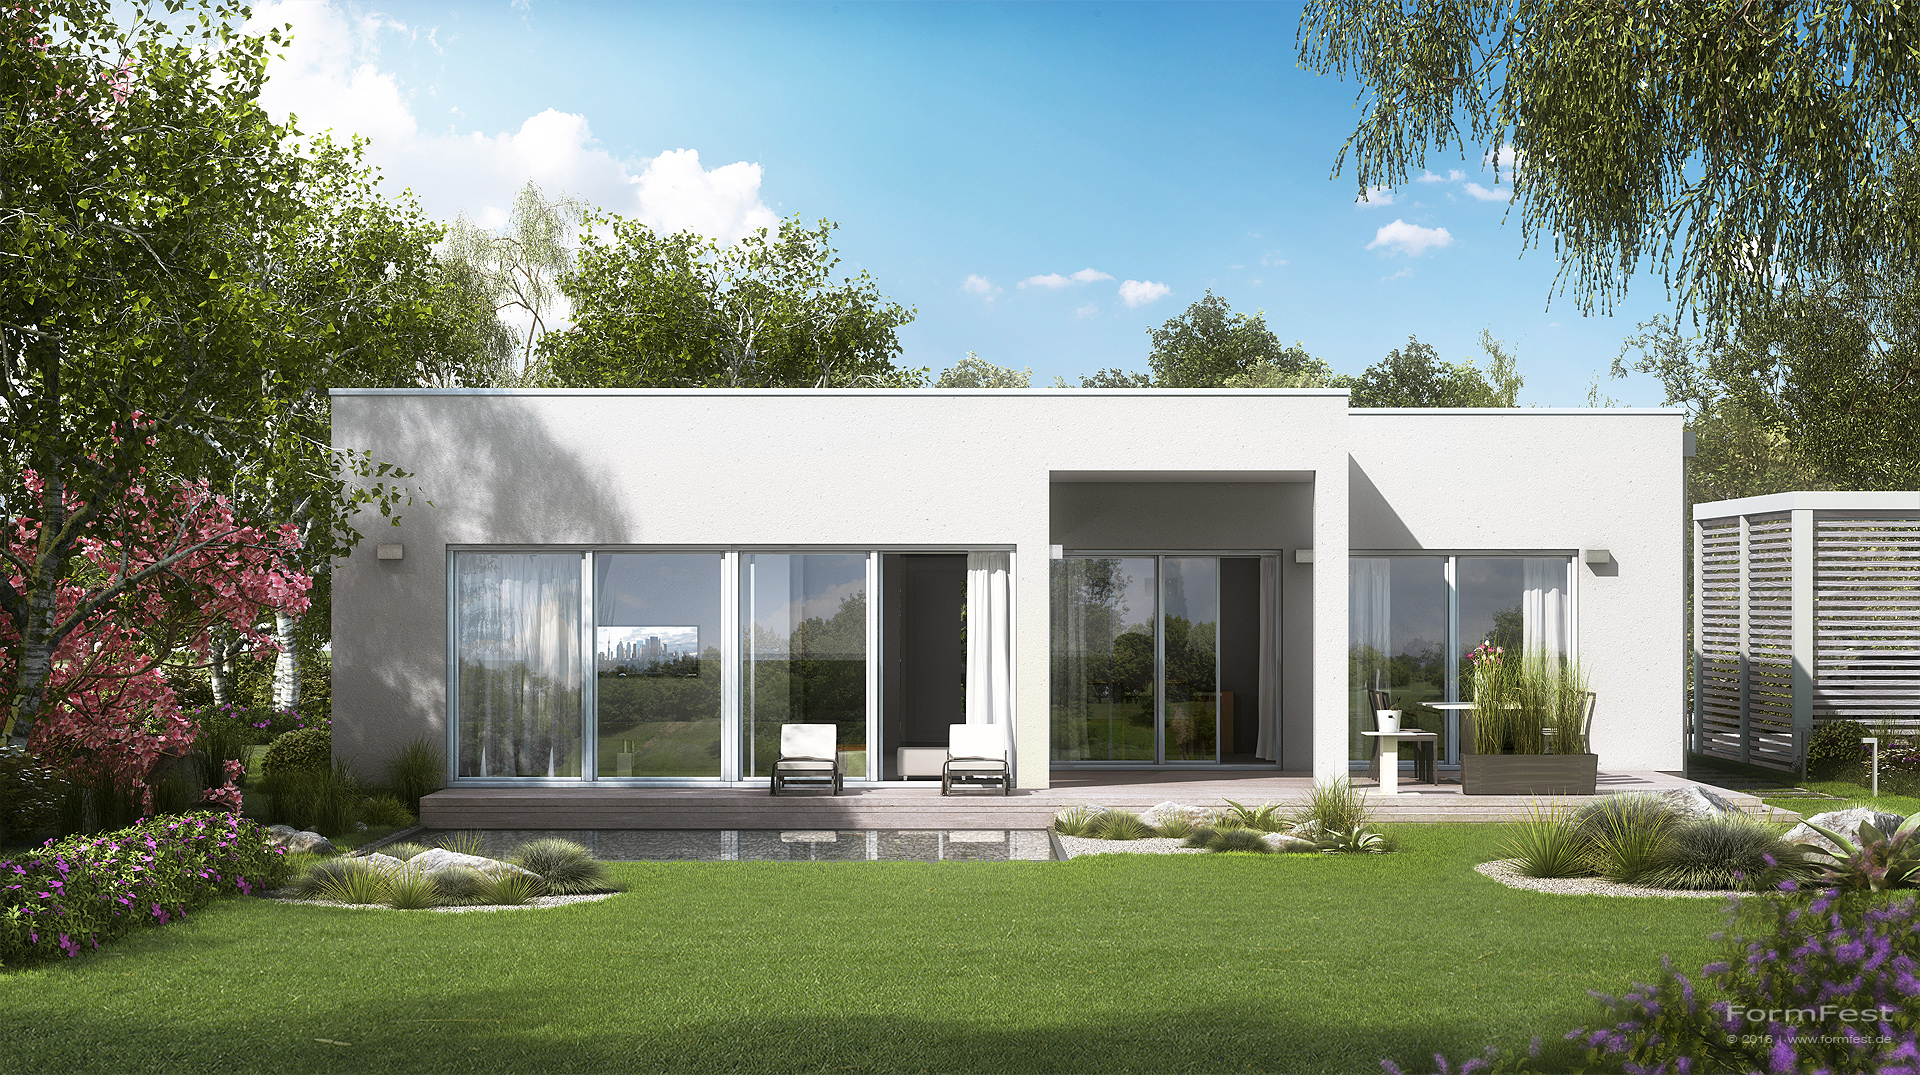 visualisierung kern haus formfest. Black Bedroom Furniture Sets. Home Design Ideas